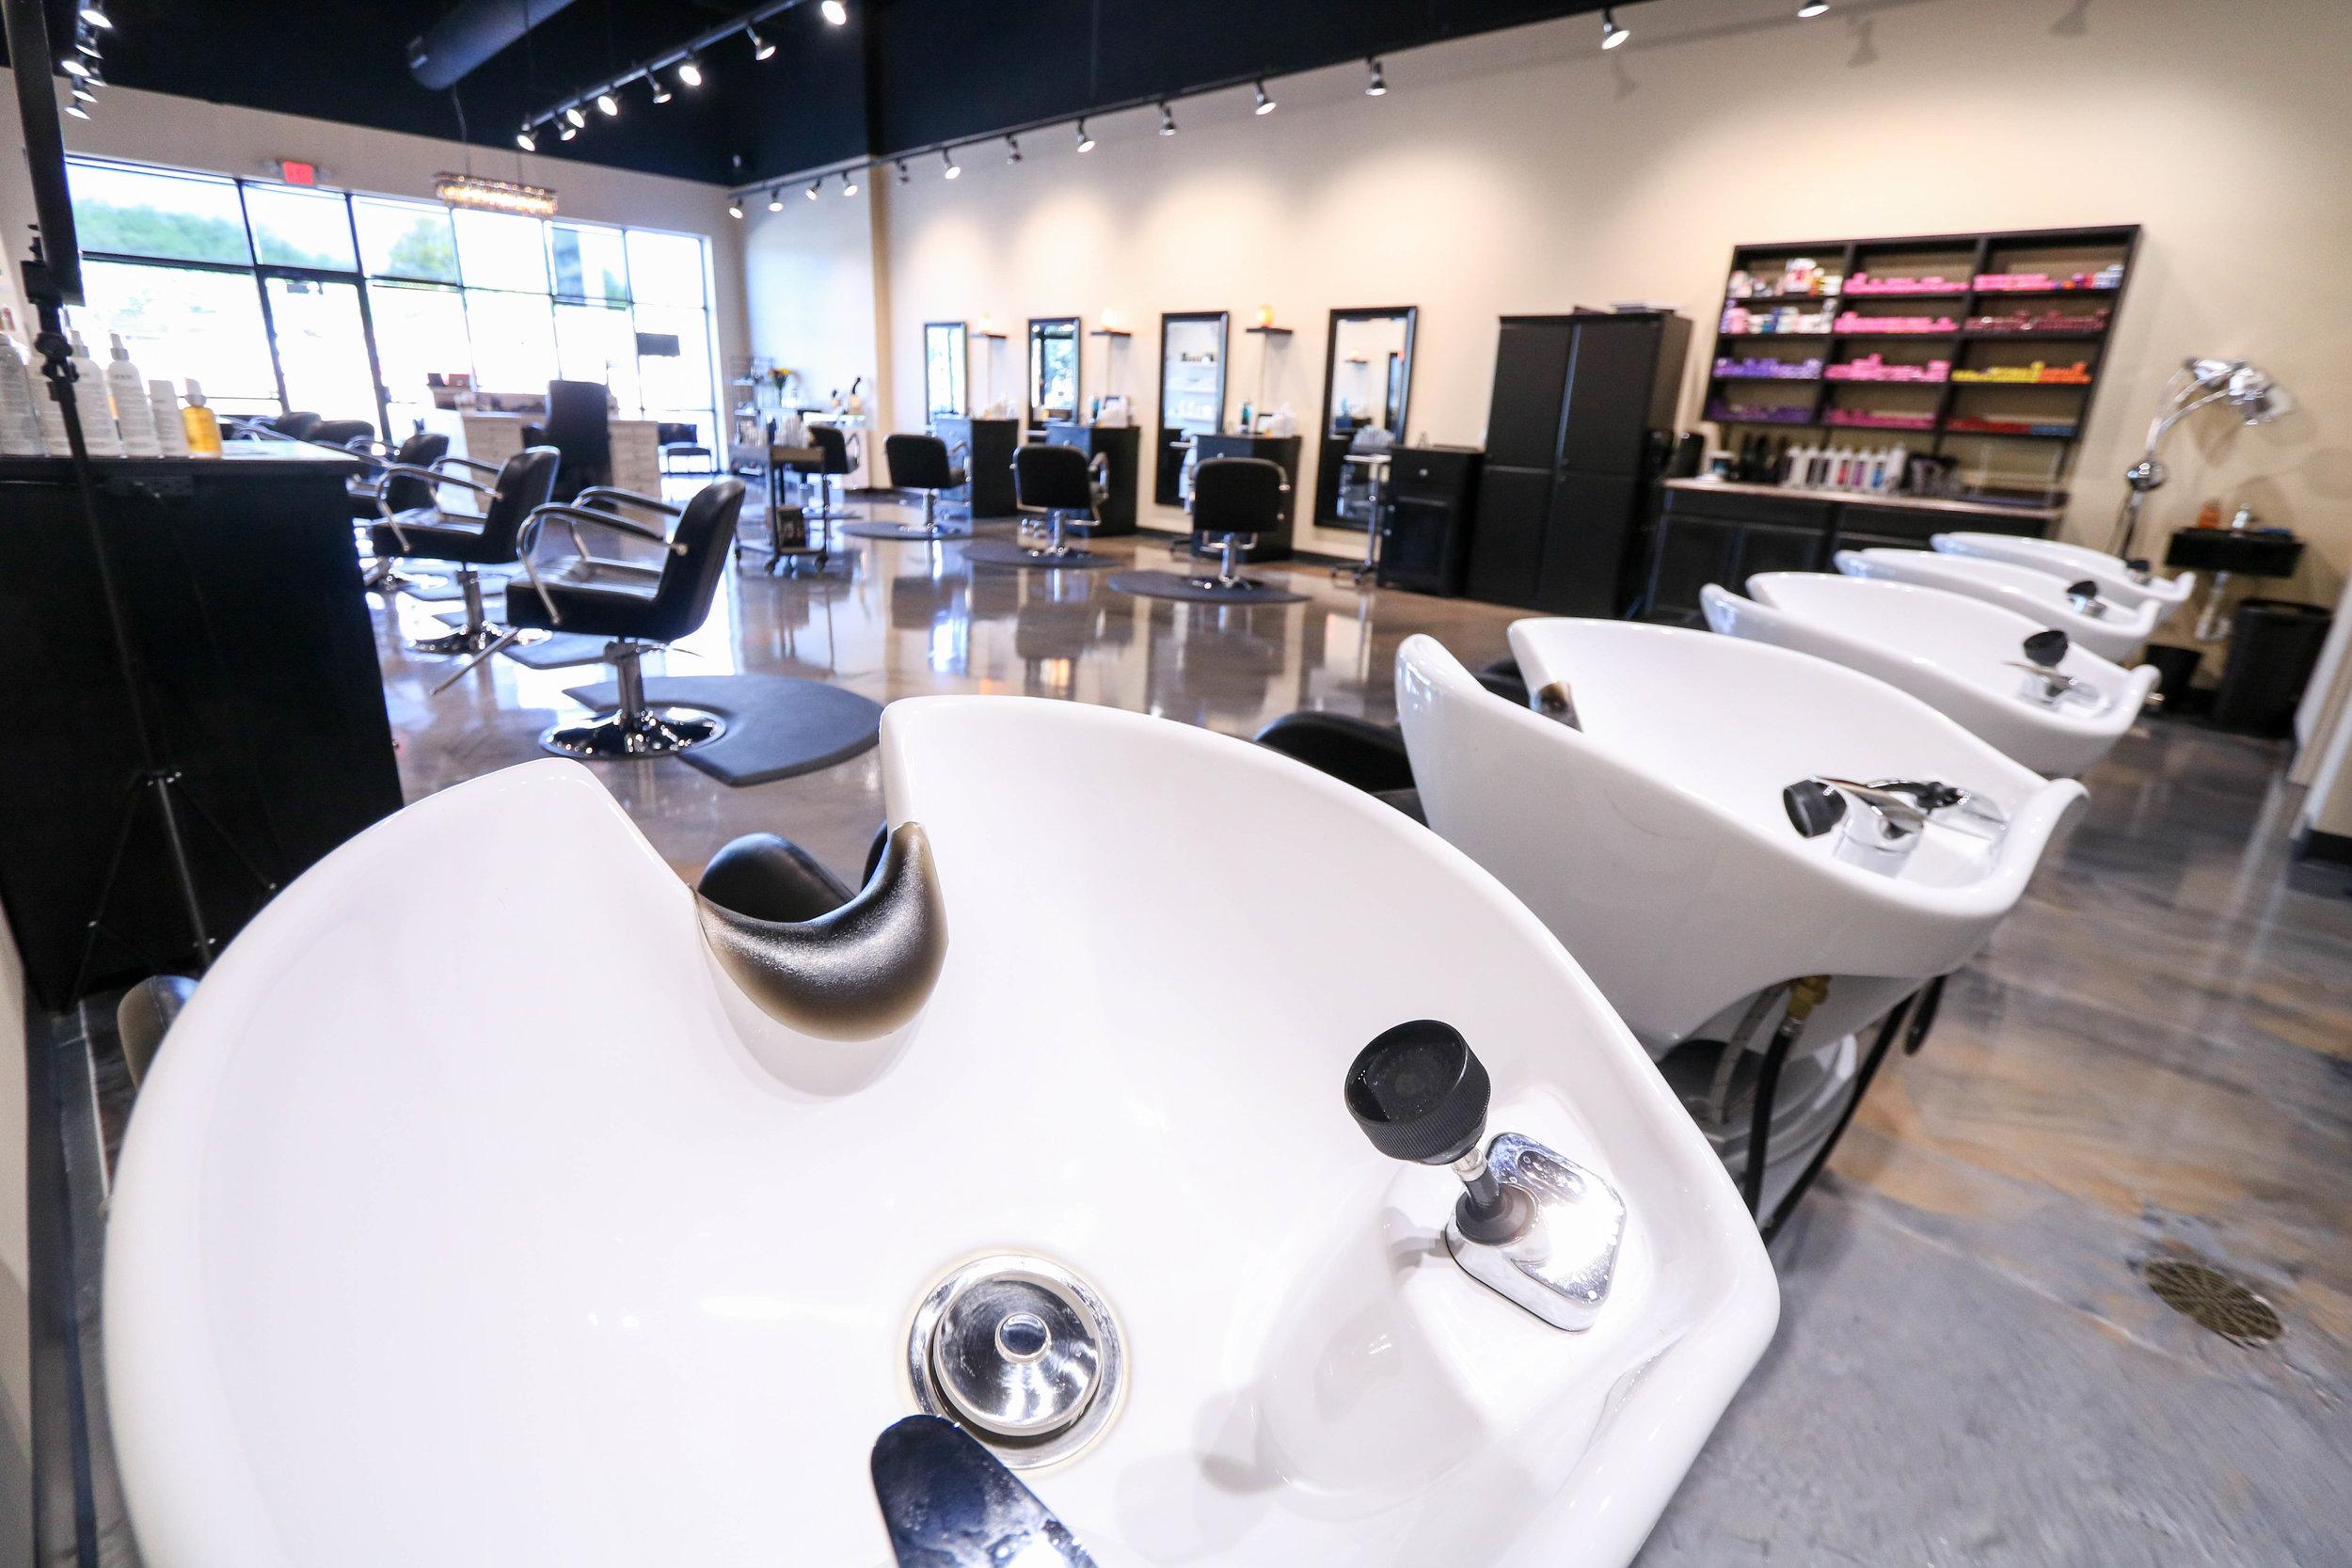 Spoleti Salon in South Austin, Texas in the zip code of 78745.